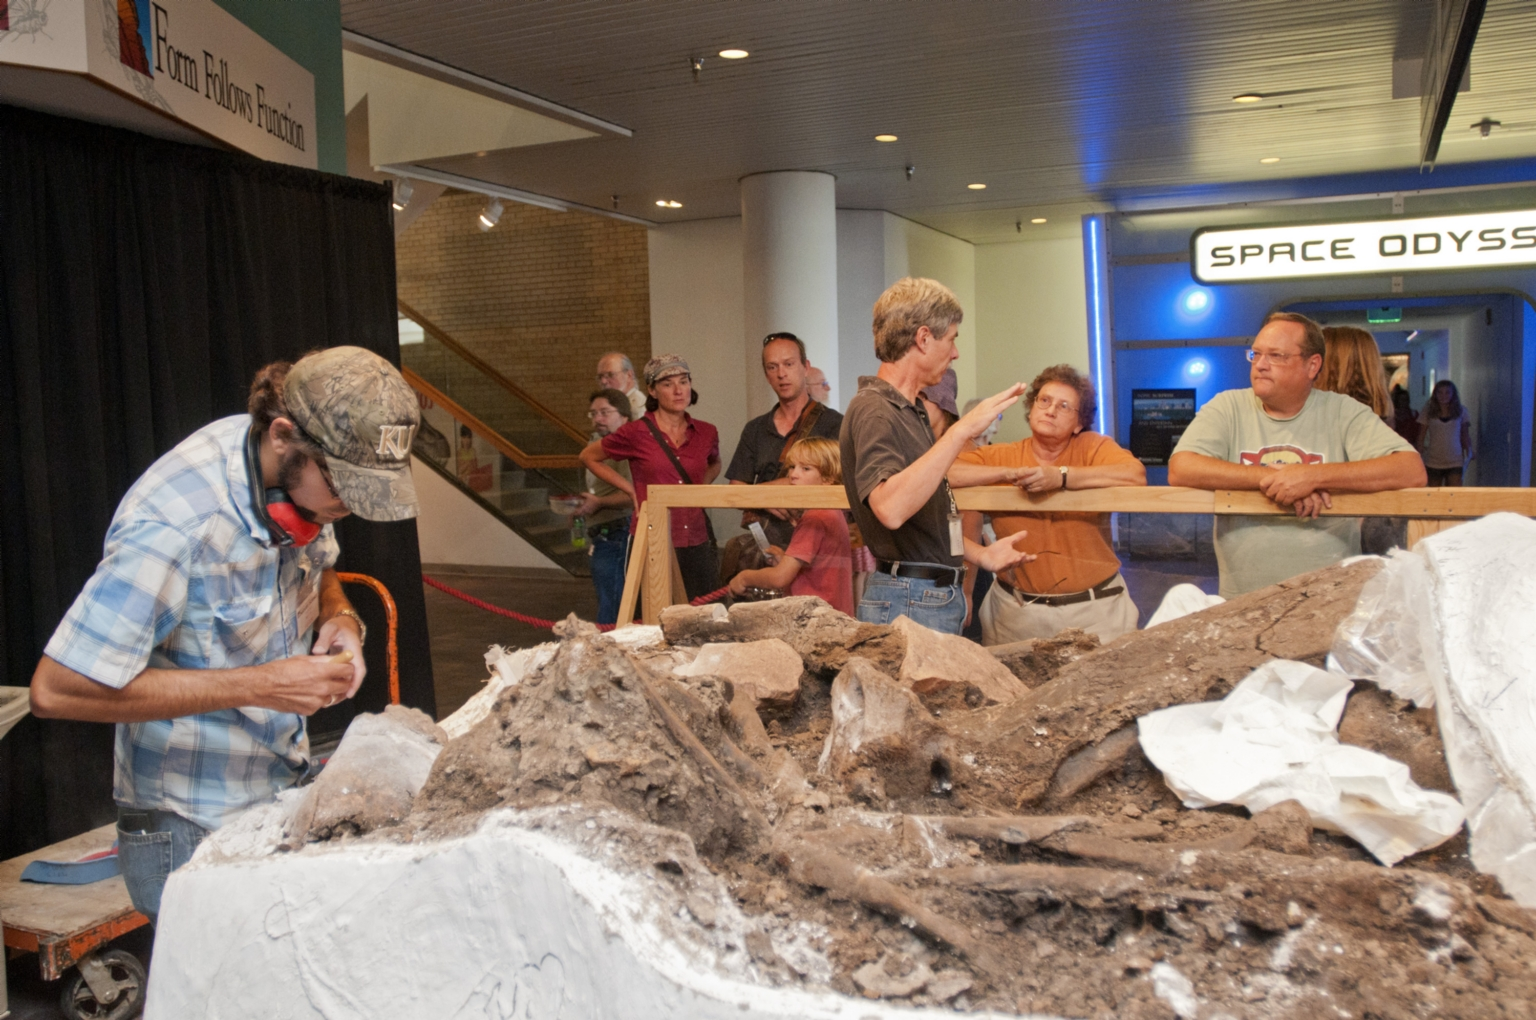 Working on Mammoth from Snomastadon Excavation in Pop-up Exhibit